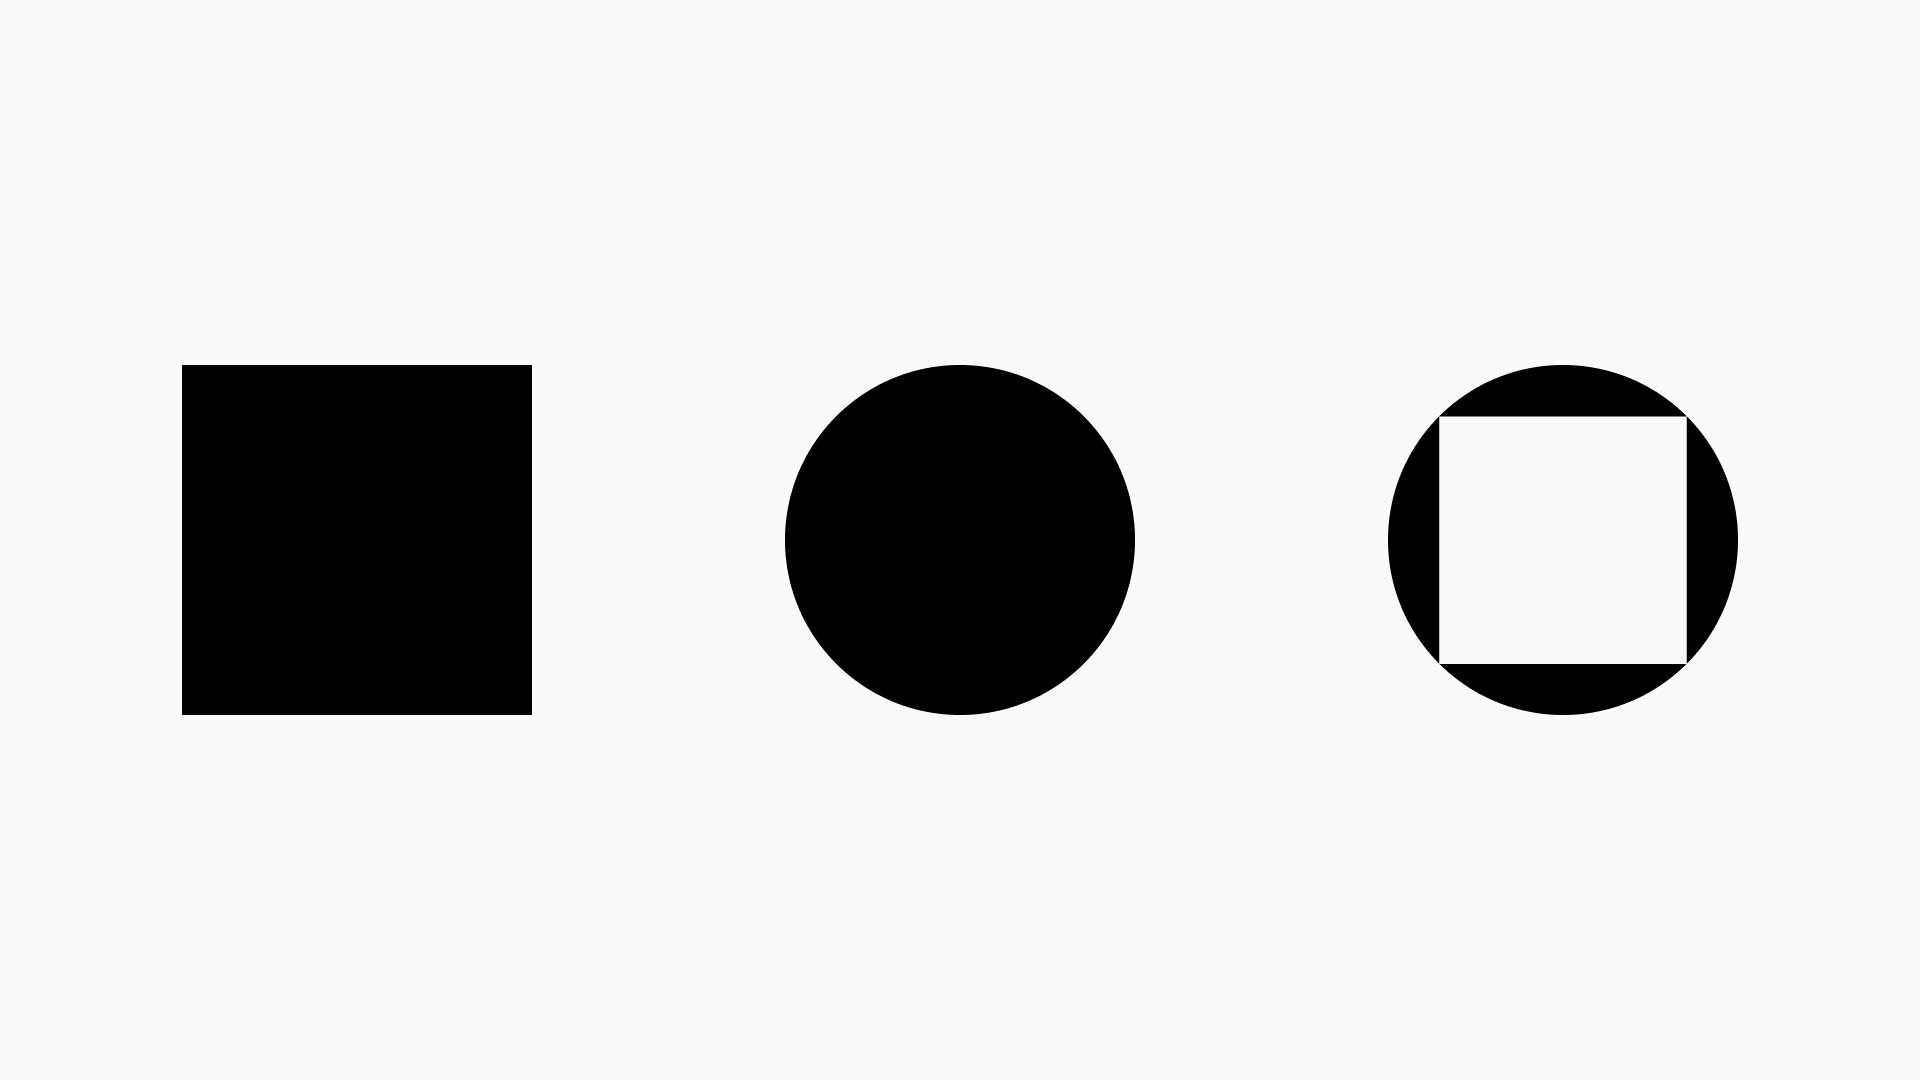 Consultech-logo-elements